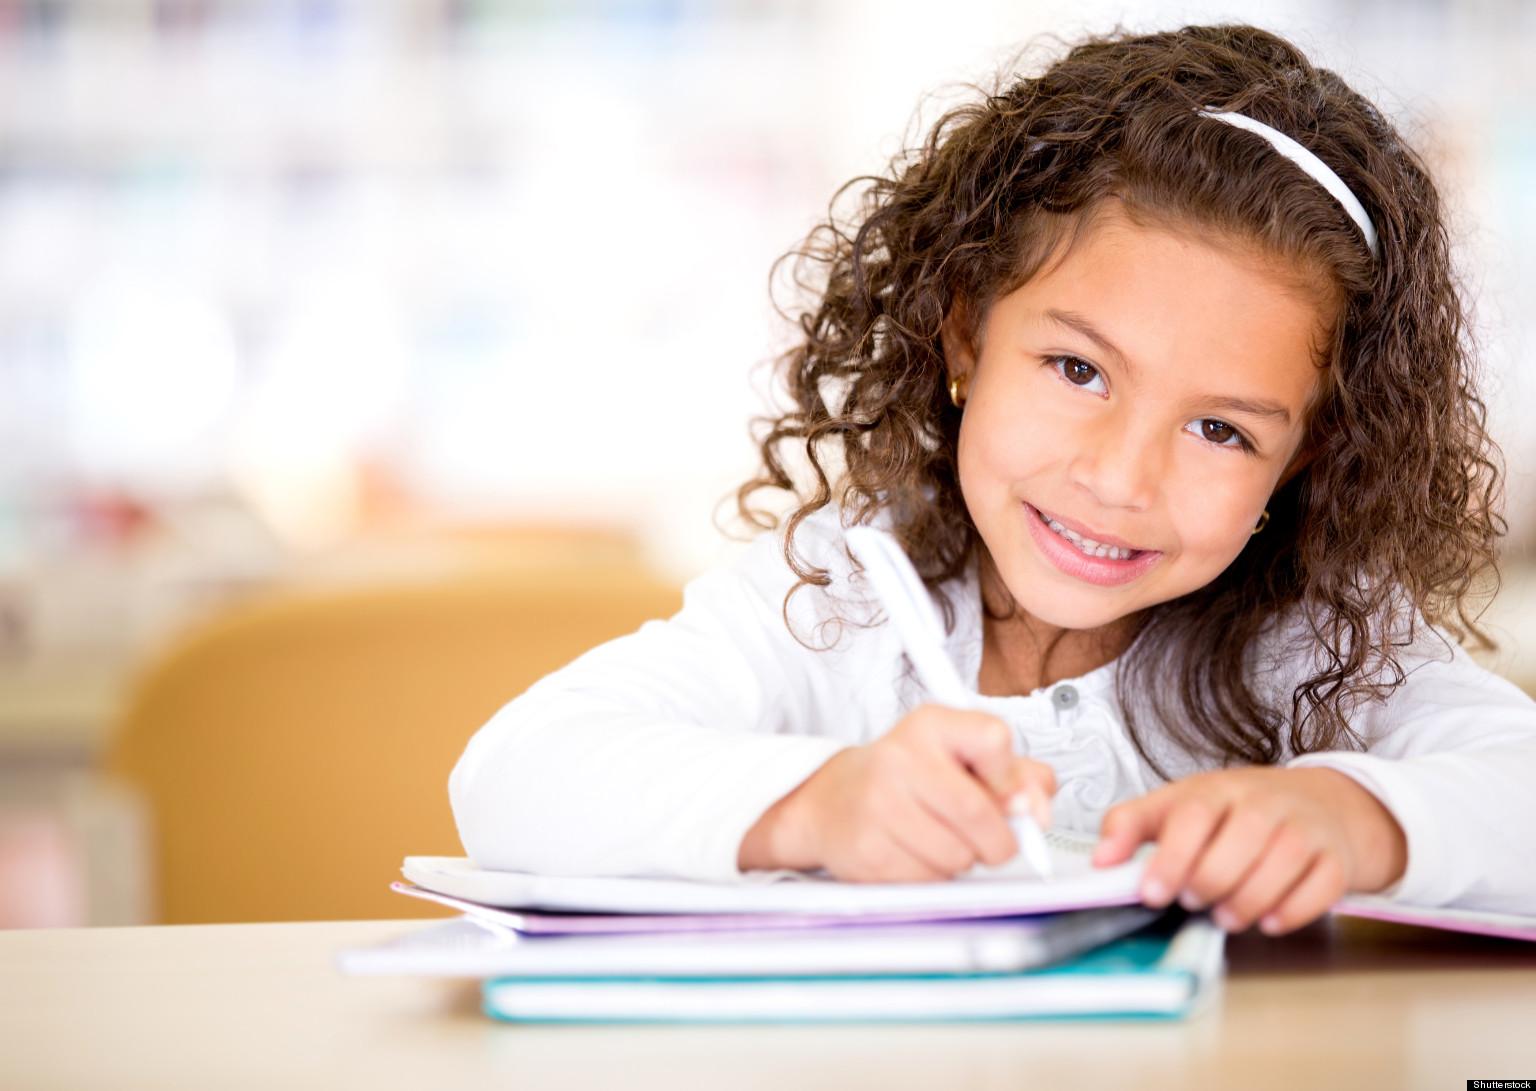 Image result for playful kids study